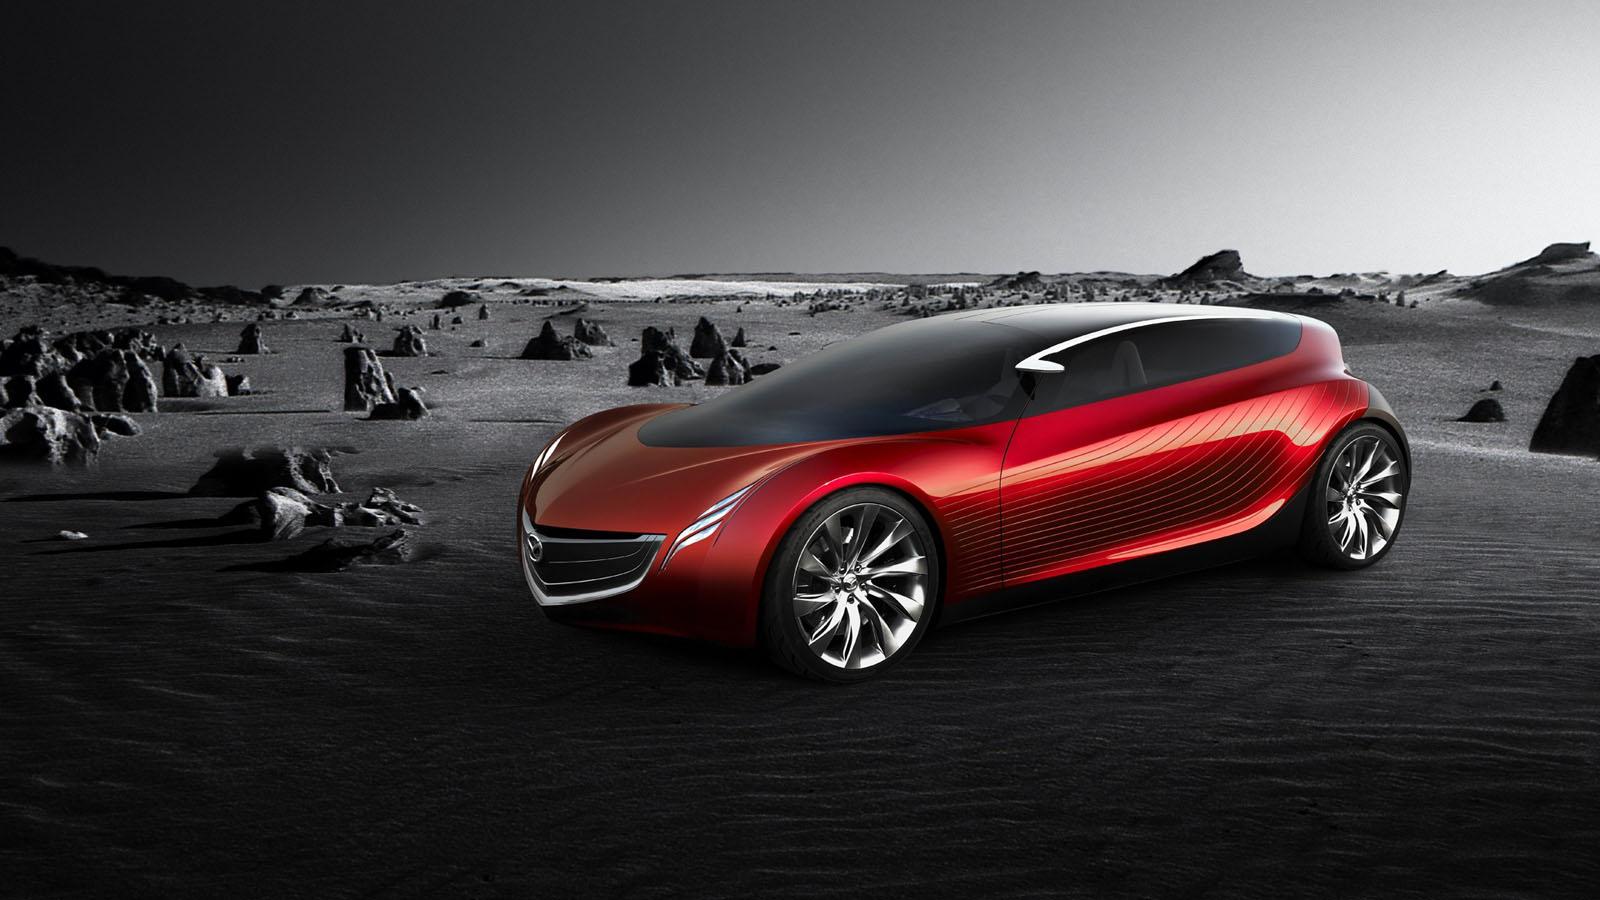 Mazda Ryuga Concept 7 1600x900 Hd  Car   Free Download HD Wallpaper